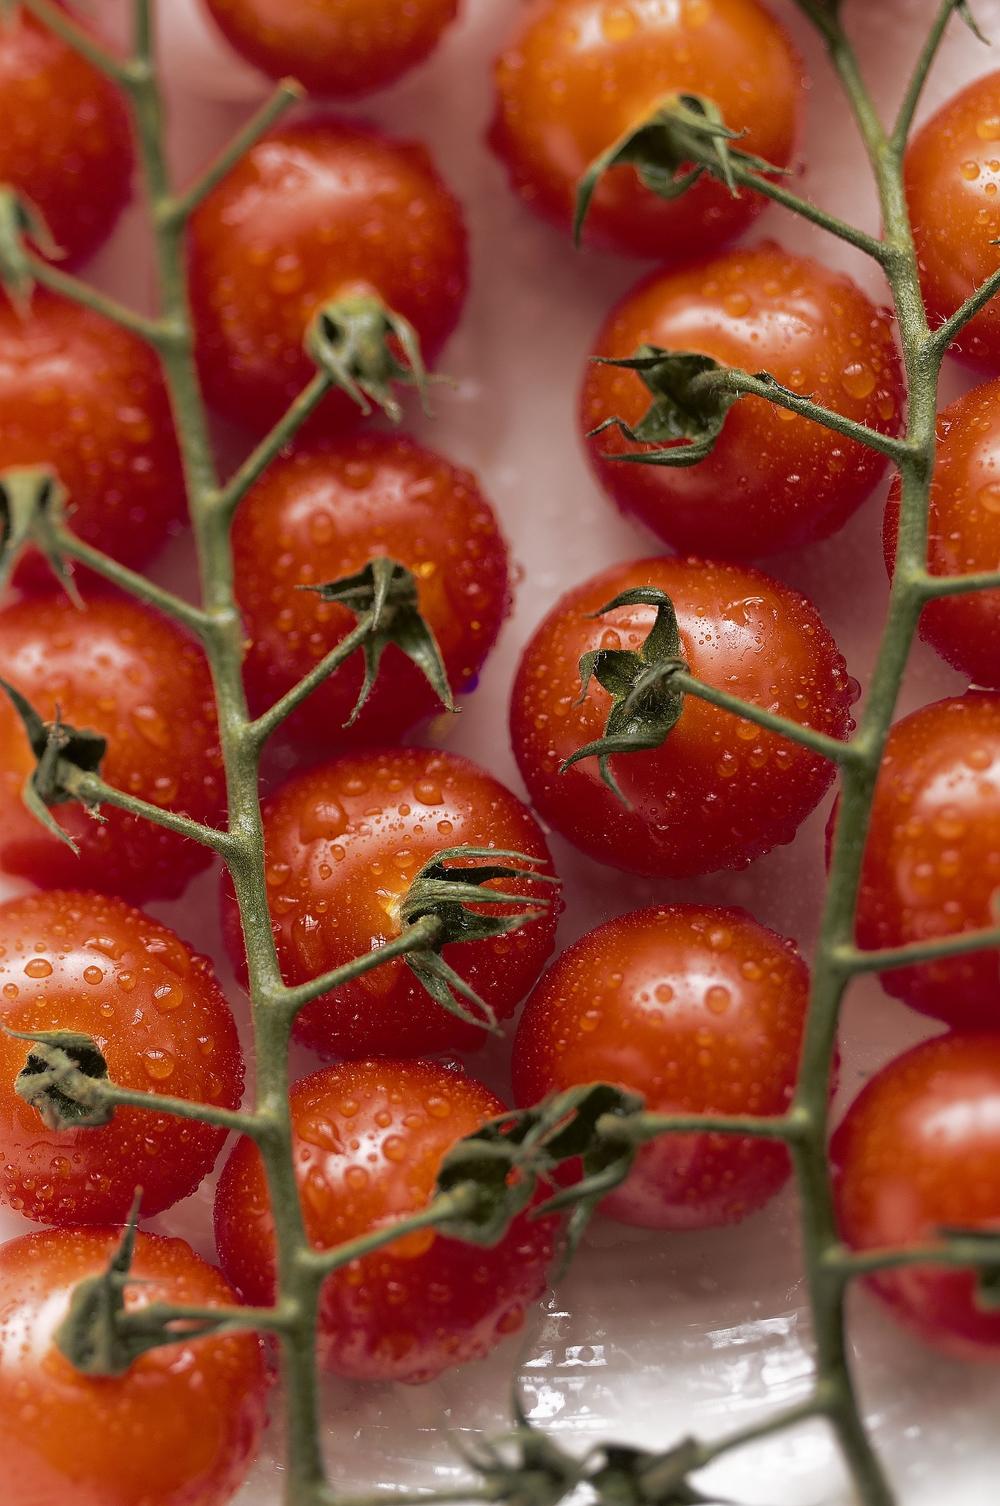 cherrytomatos.jpg